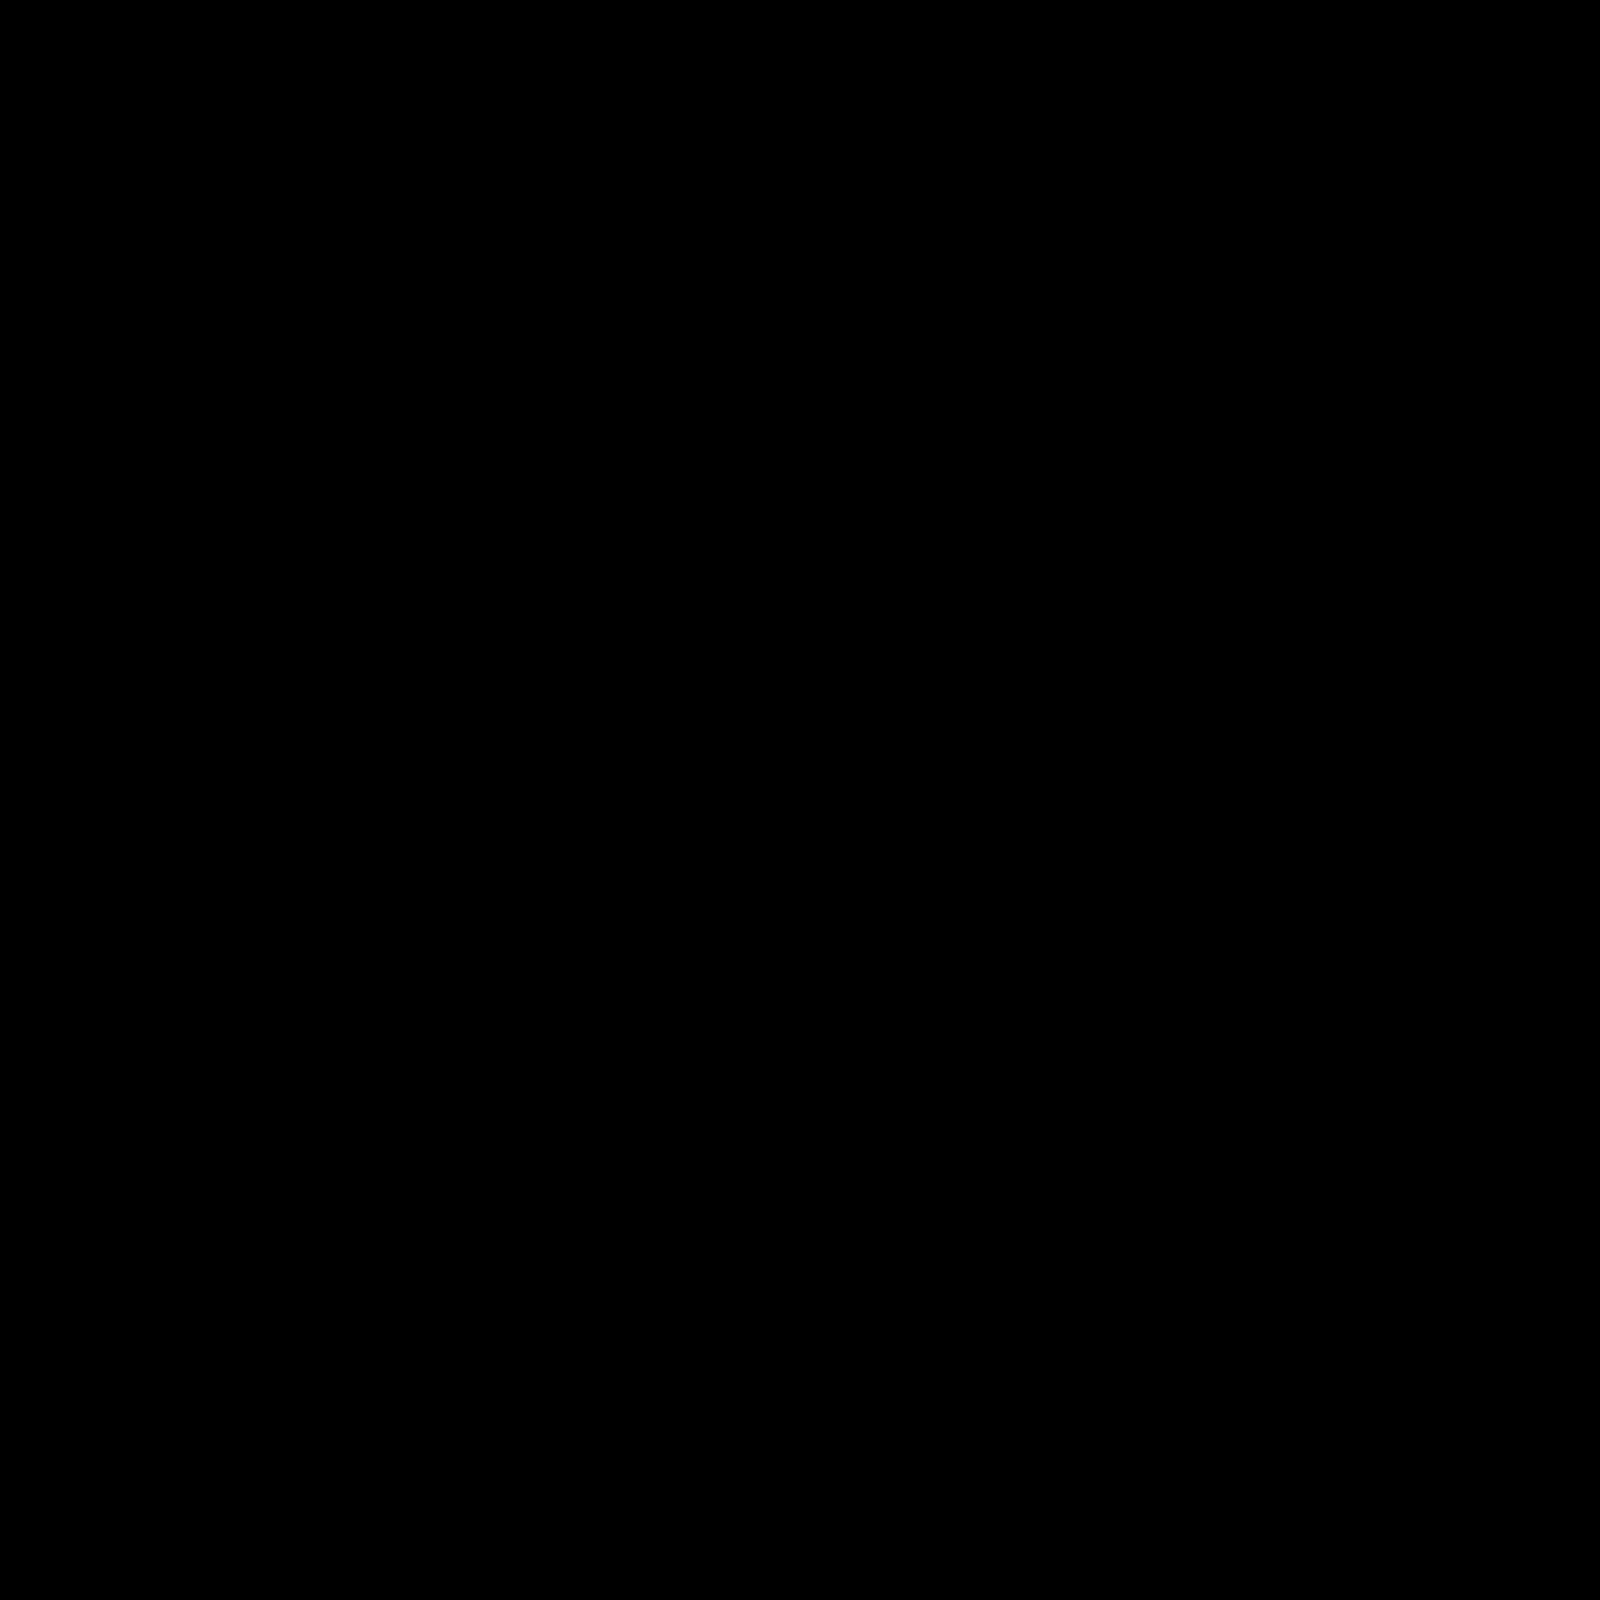 Fidget Spinner Filled icon